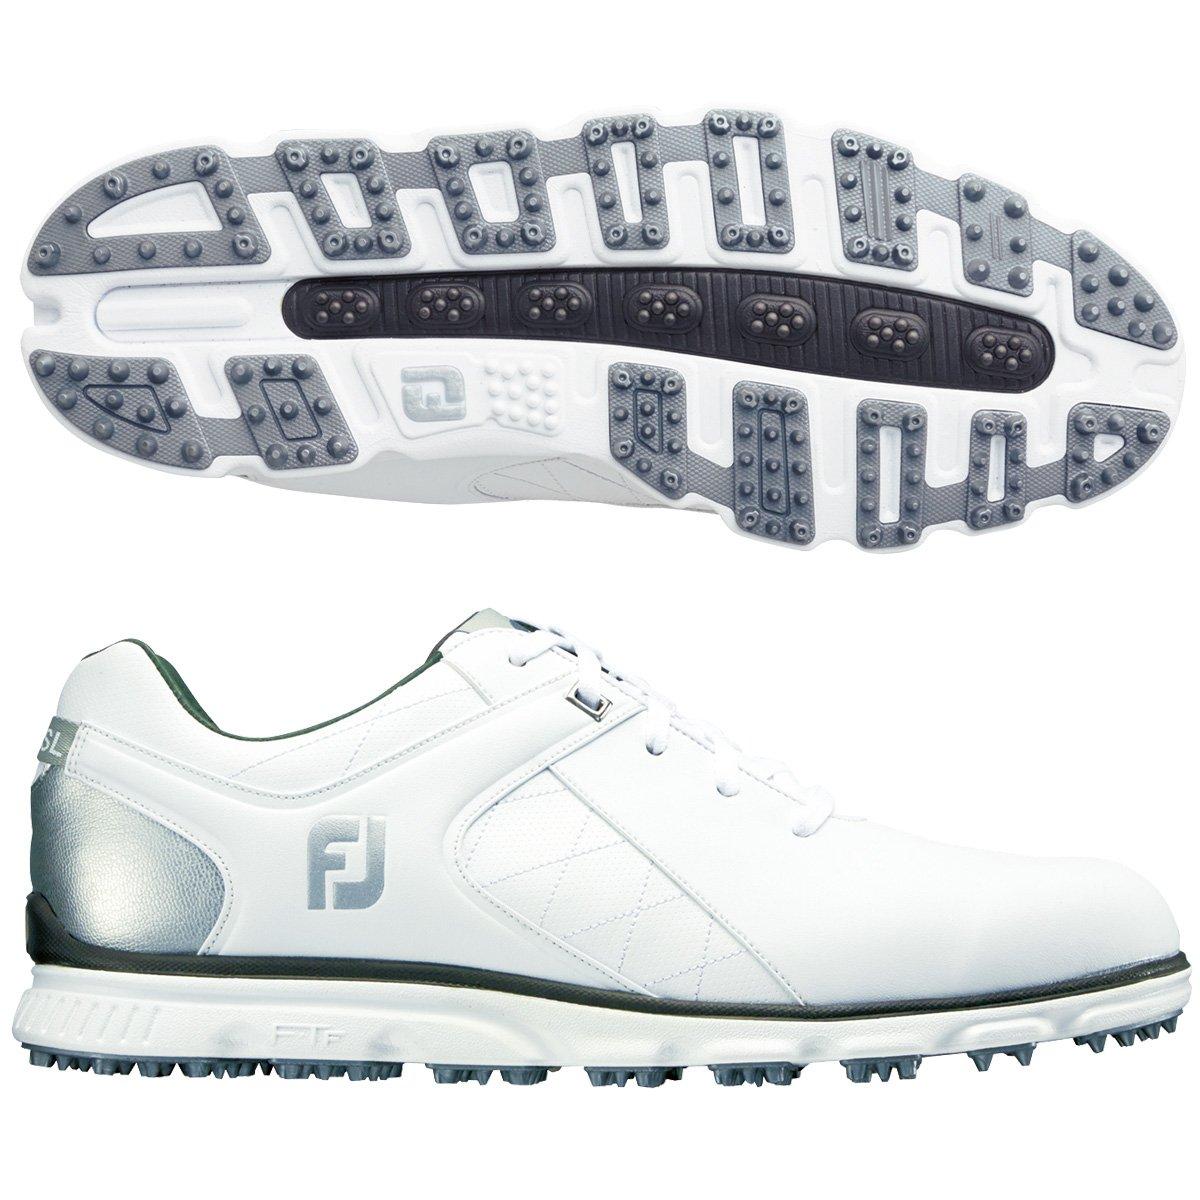 FootJoy Men's Pro/SL Golf Shoes B01JJRH4Y4 9 XW US White/Silver